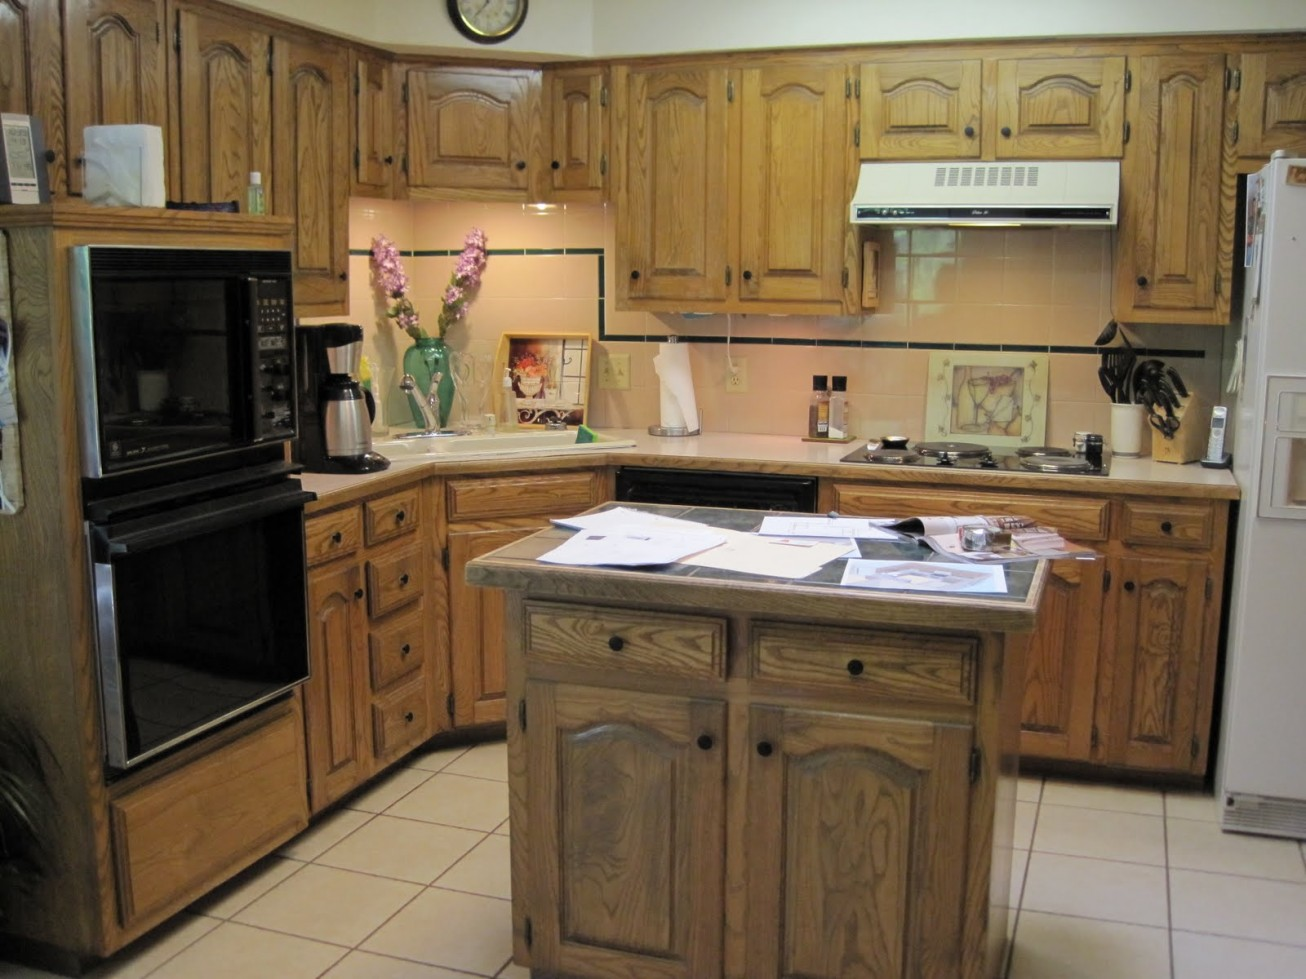 Wooden childrens kitchen set kitchen ideas for Kitchen setting ideas